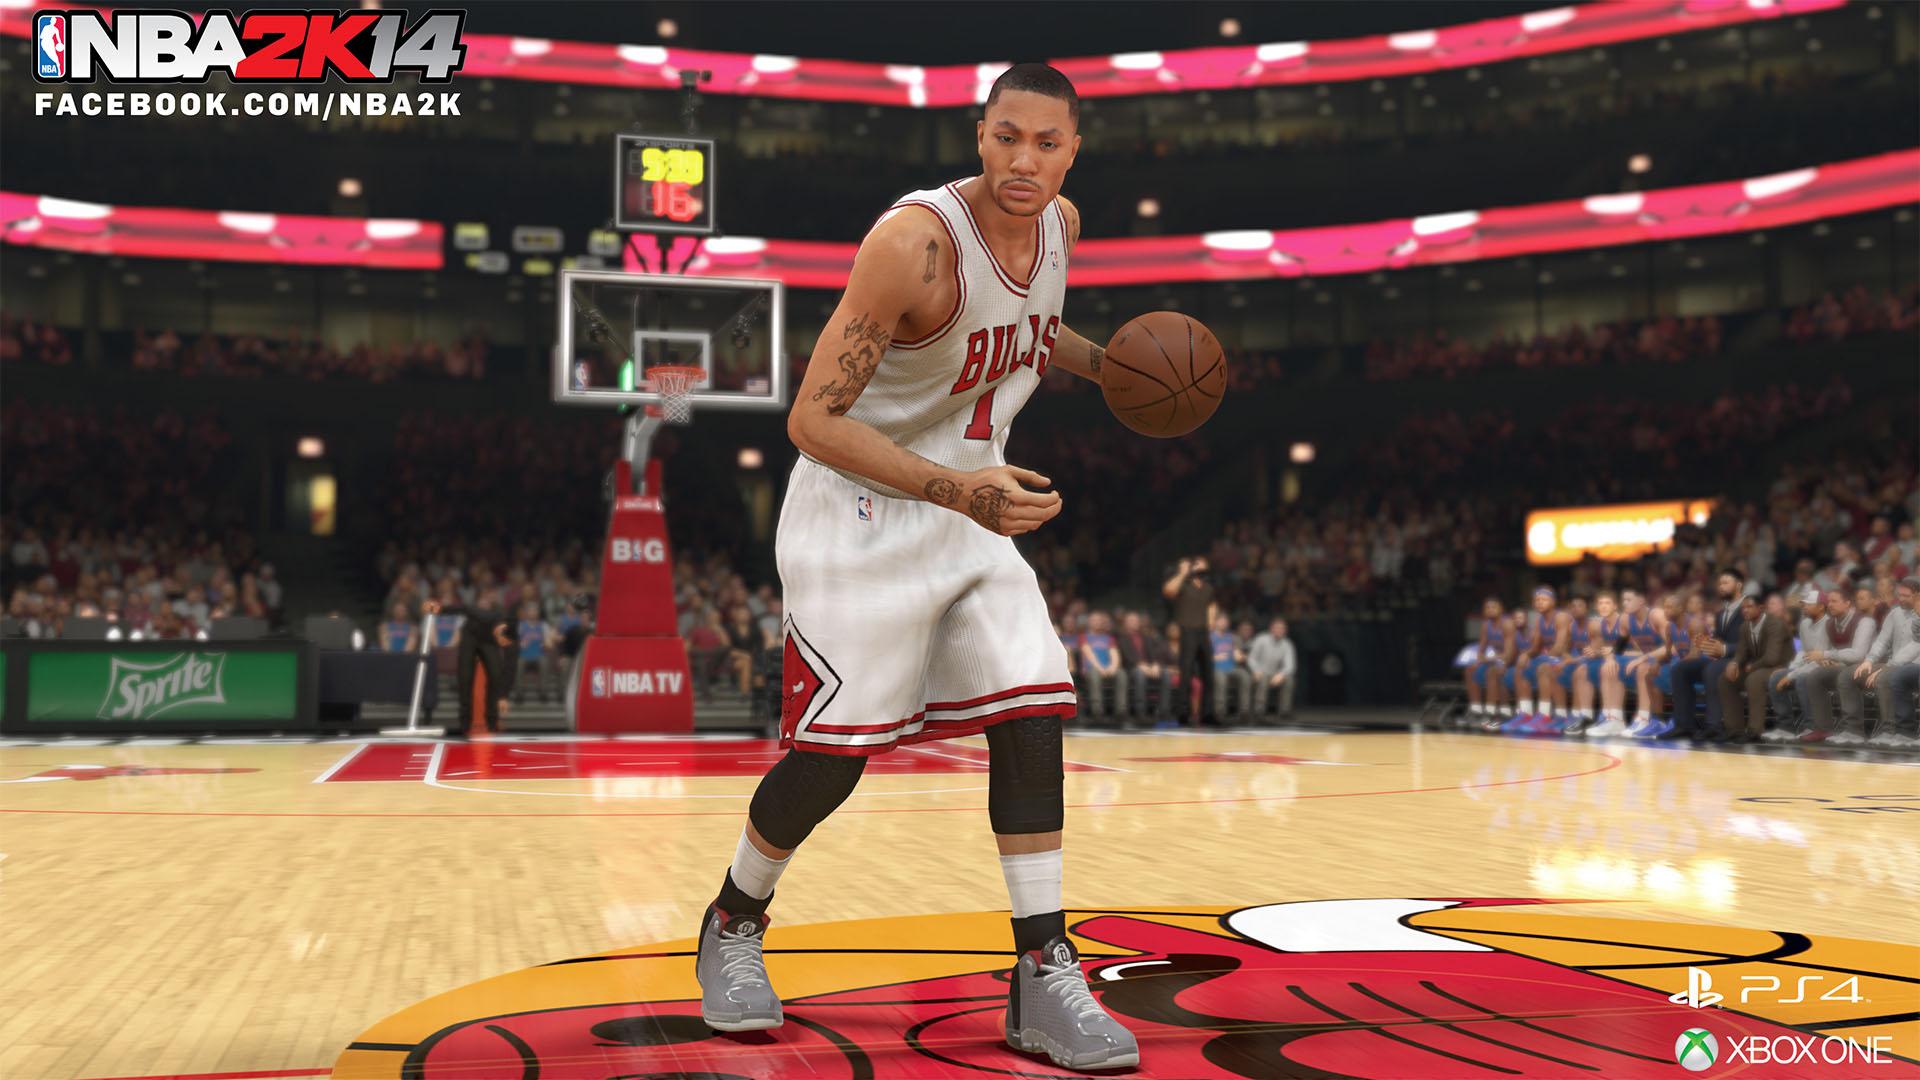 Derrick Rose Chicago Bulls NBA 2K14 1920x1080